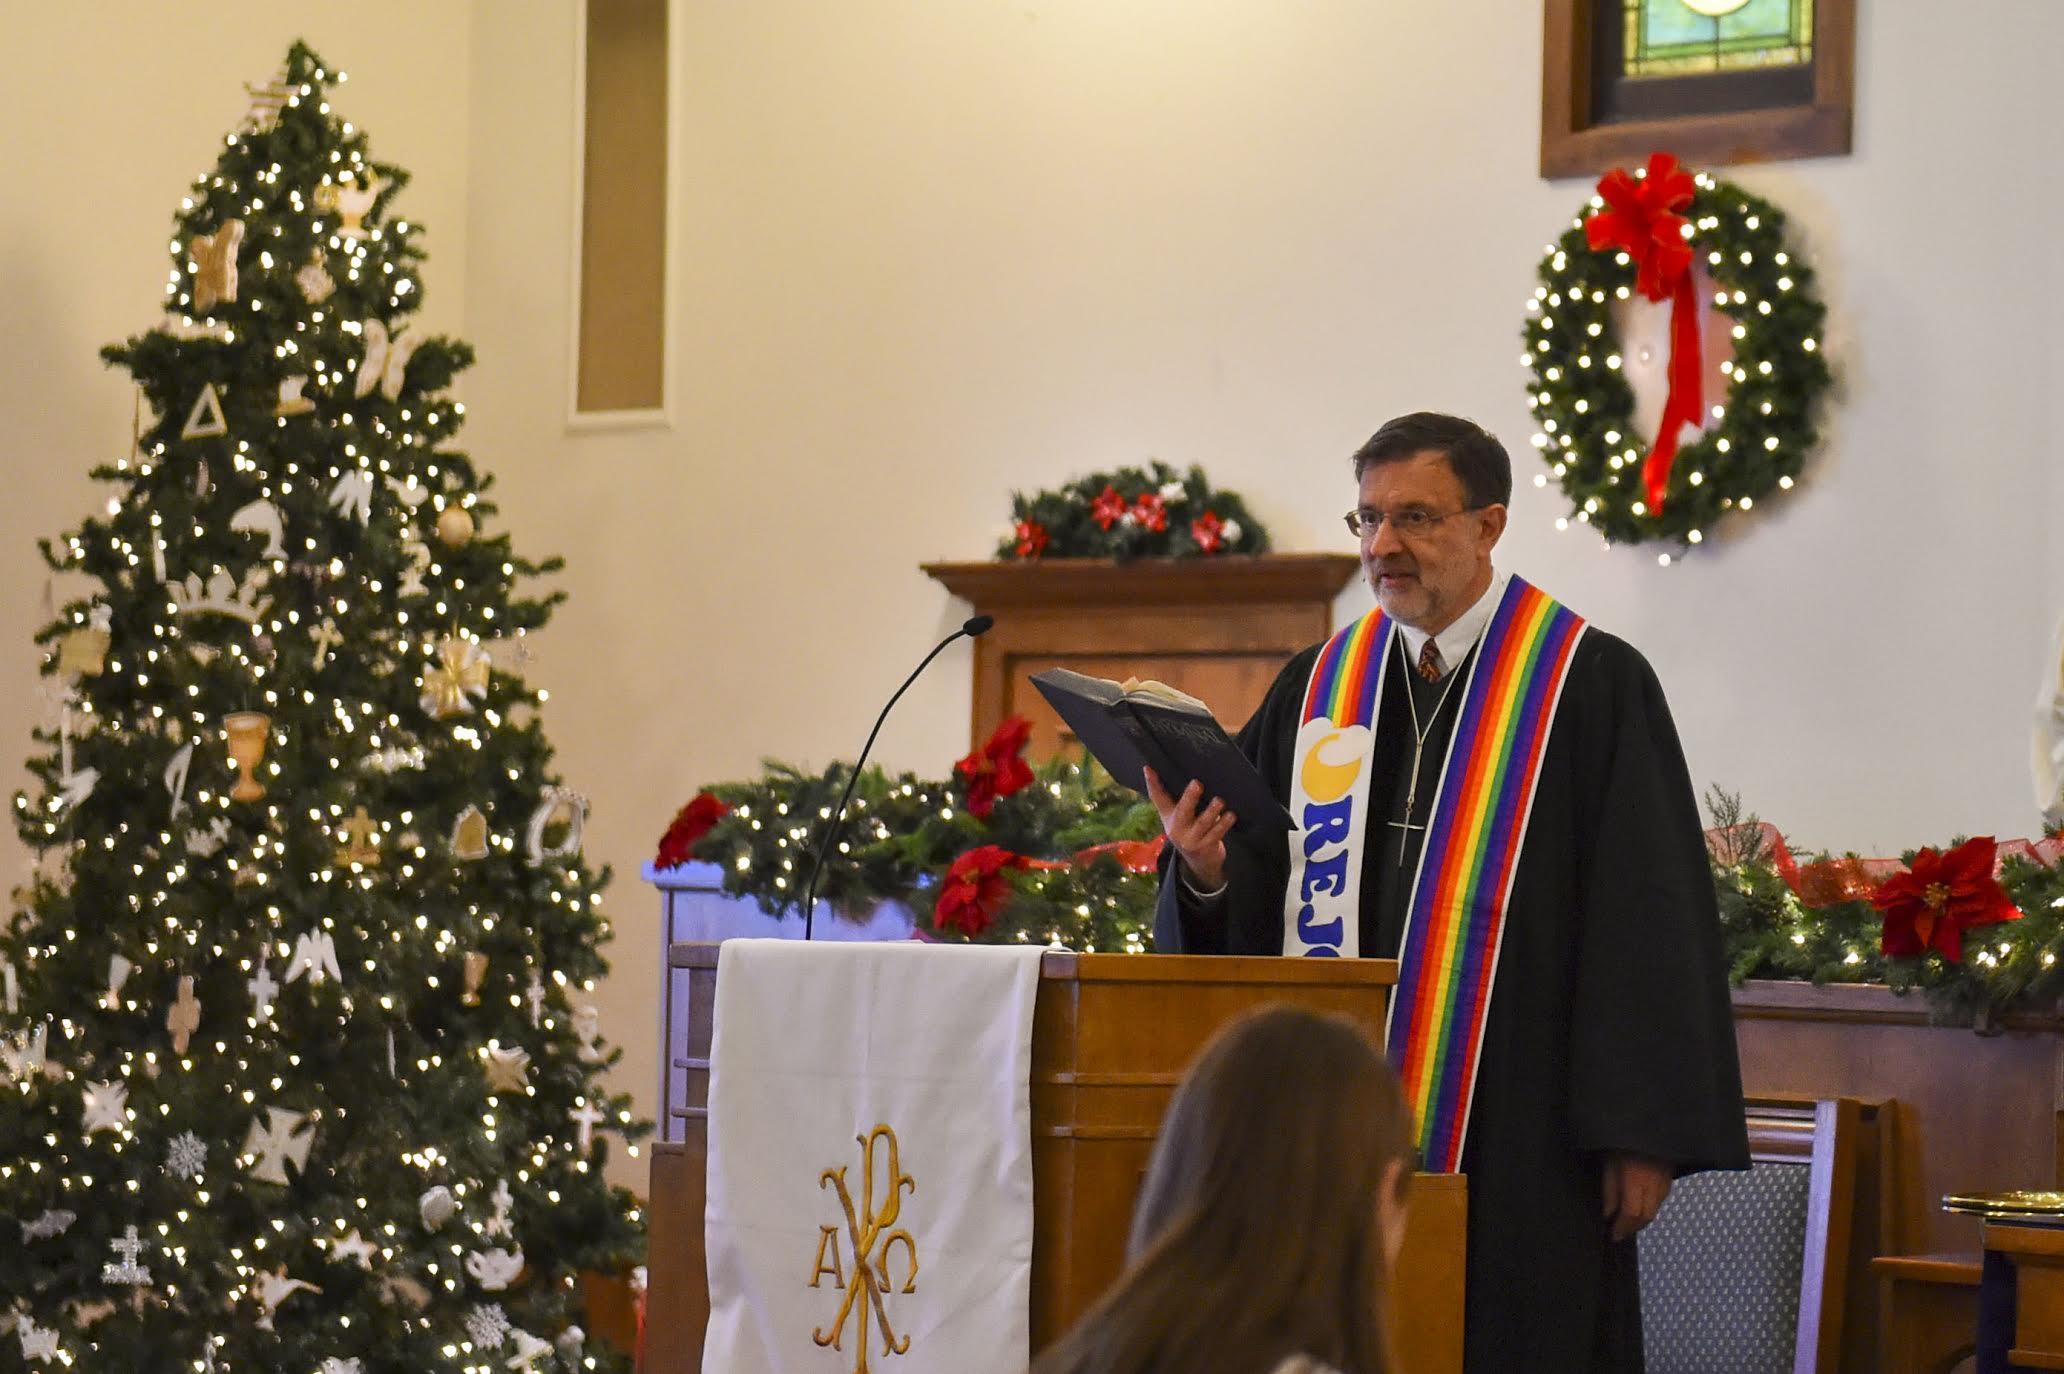 Reverend Russel Urban - Pastor